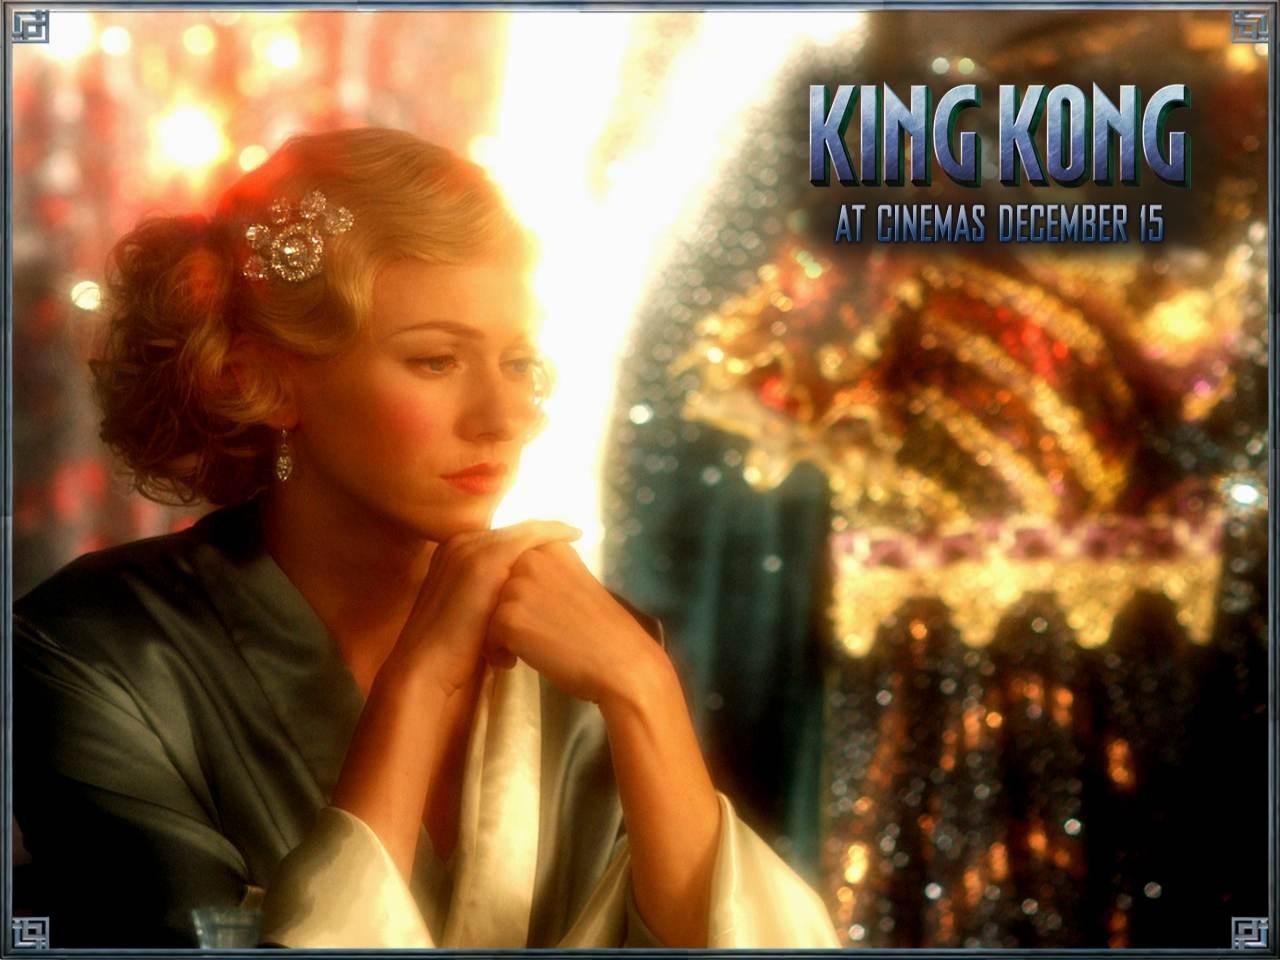 Wallpaper del film King Kong con Naomi Watts